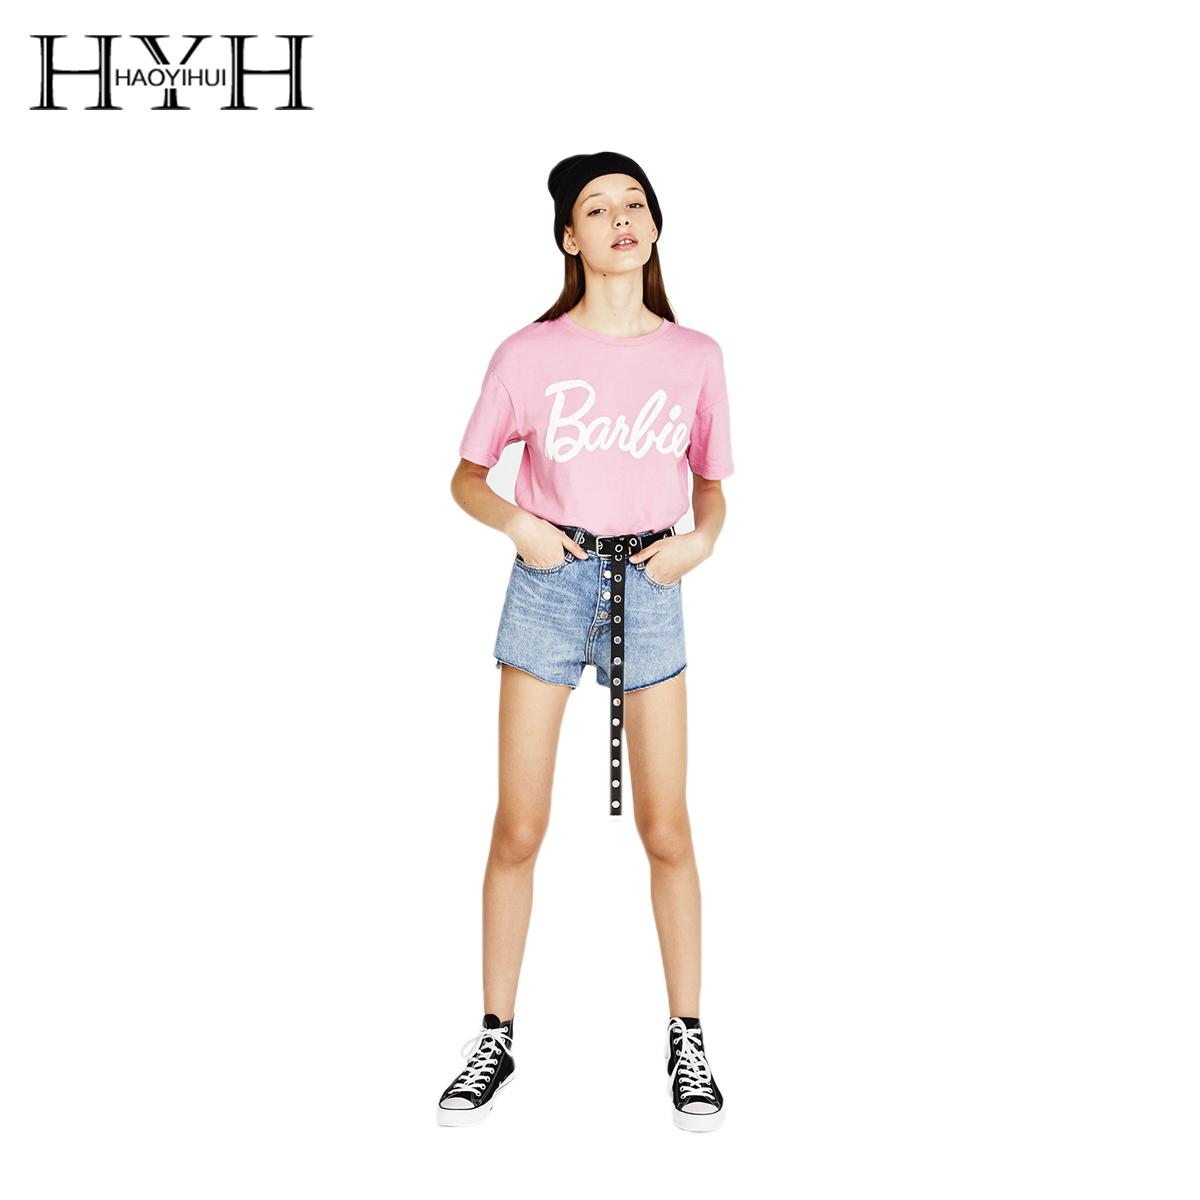 Hyh Haoyihui 새로운 패션 2018 여성 라이트 핑크 캐주얼 달콤한 티셔츠 문자 인쇄 짧은 소매 티셔츠 여성 O - 넥 탑 Y19060601